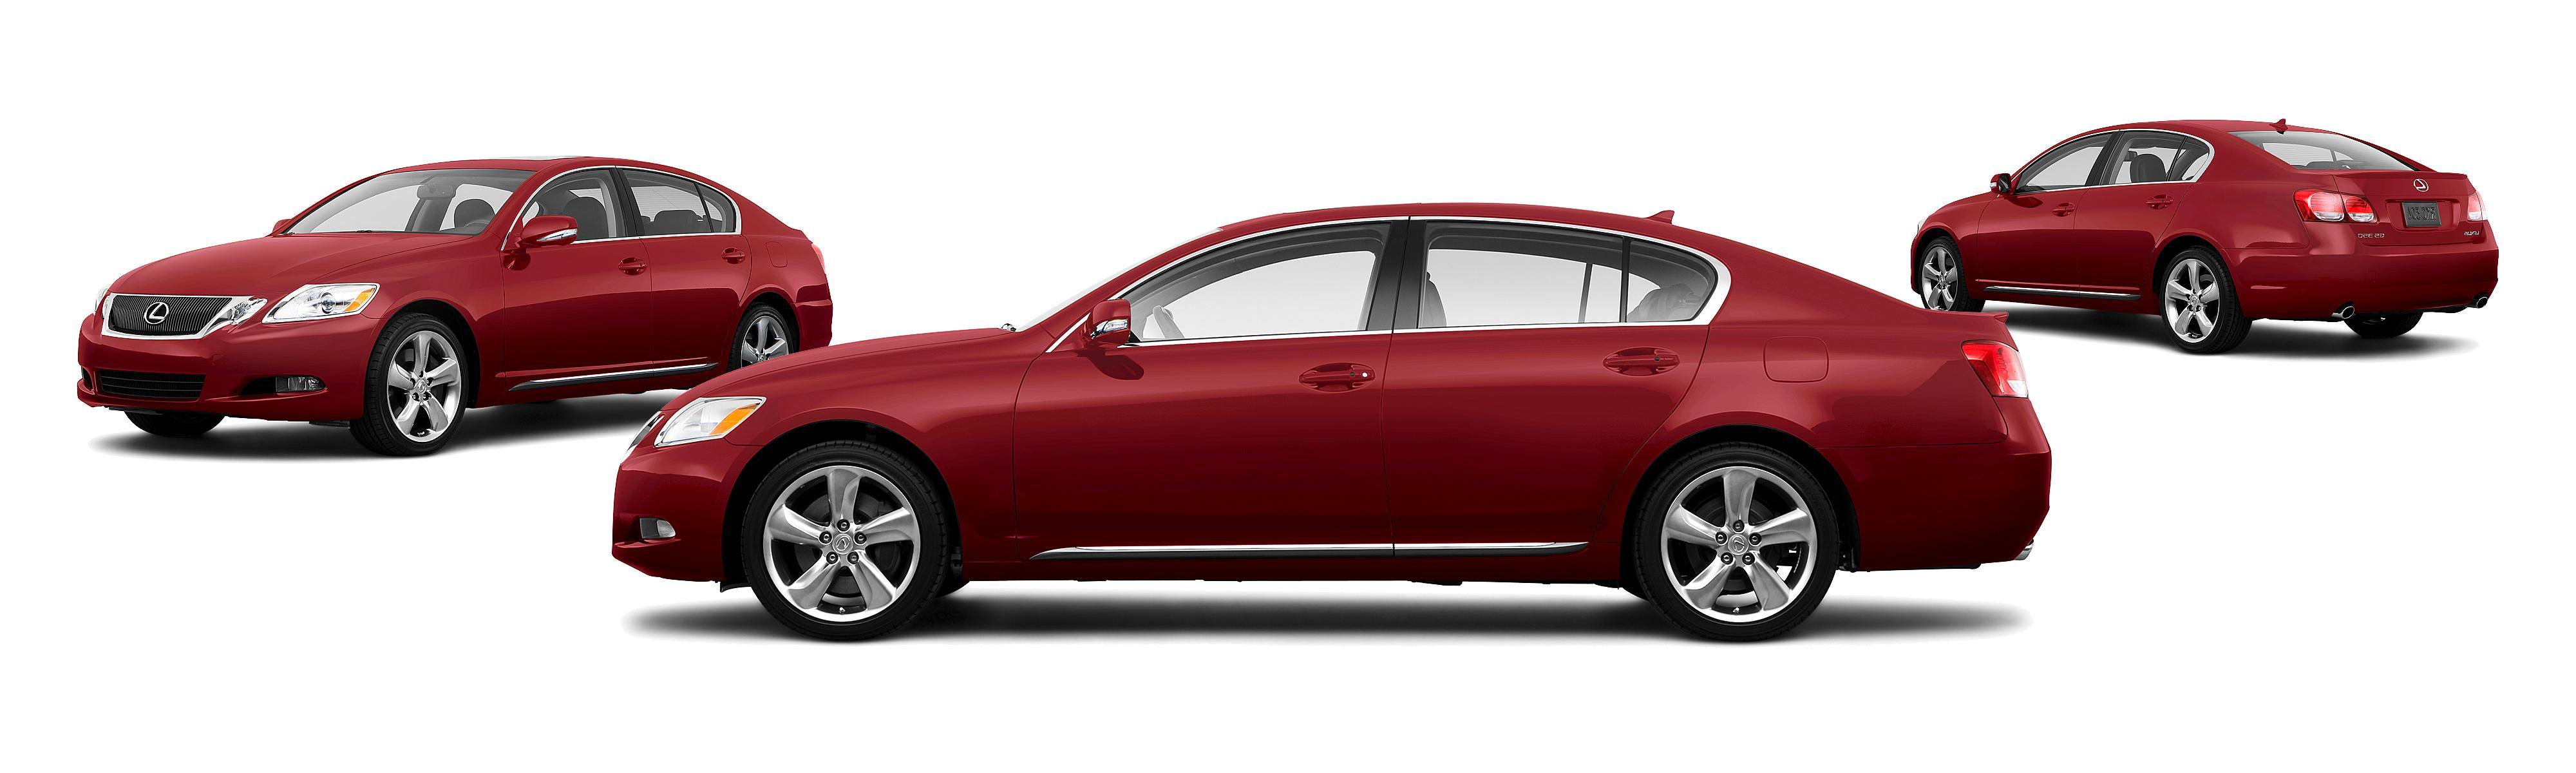 2010 Lexus GS 450h 4dr Sedan - Research - GrooveCar